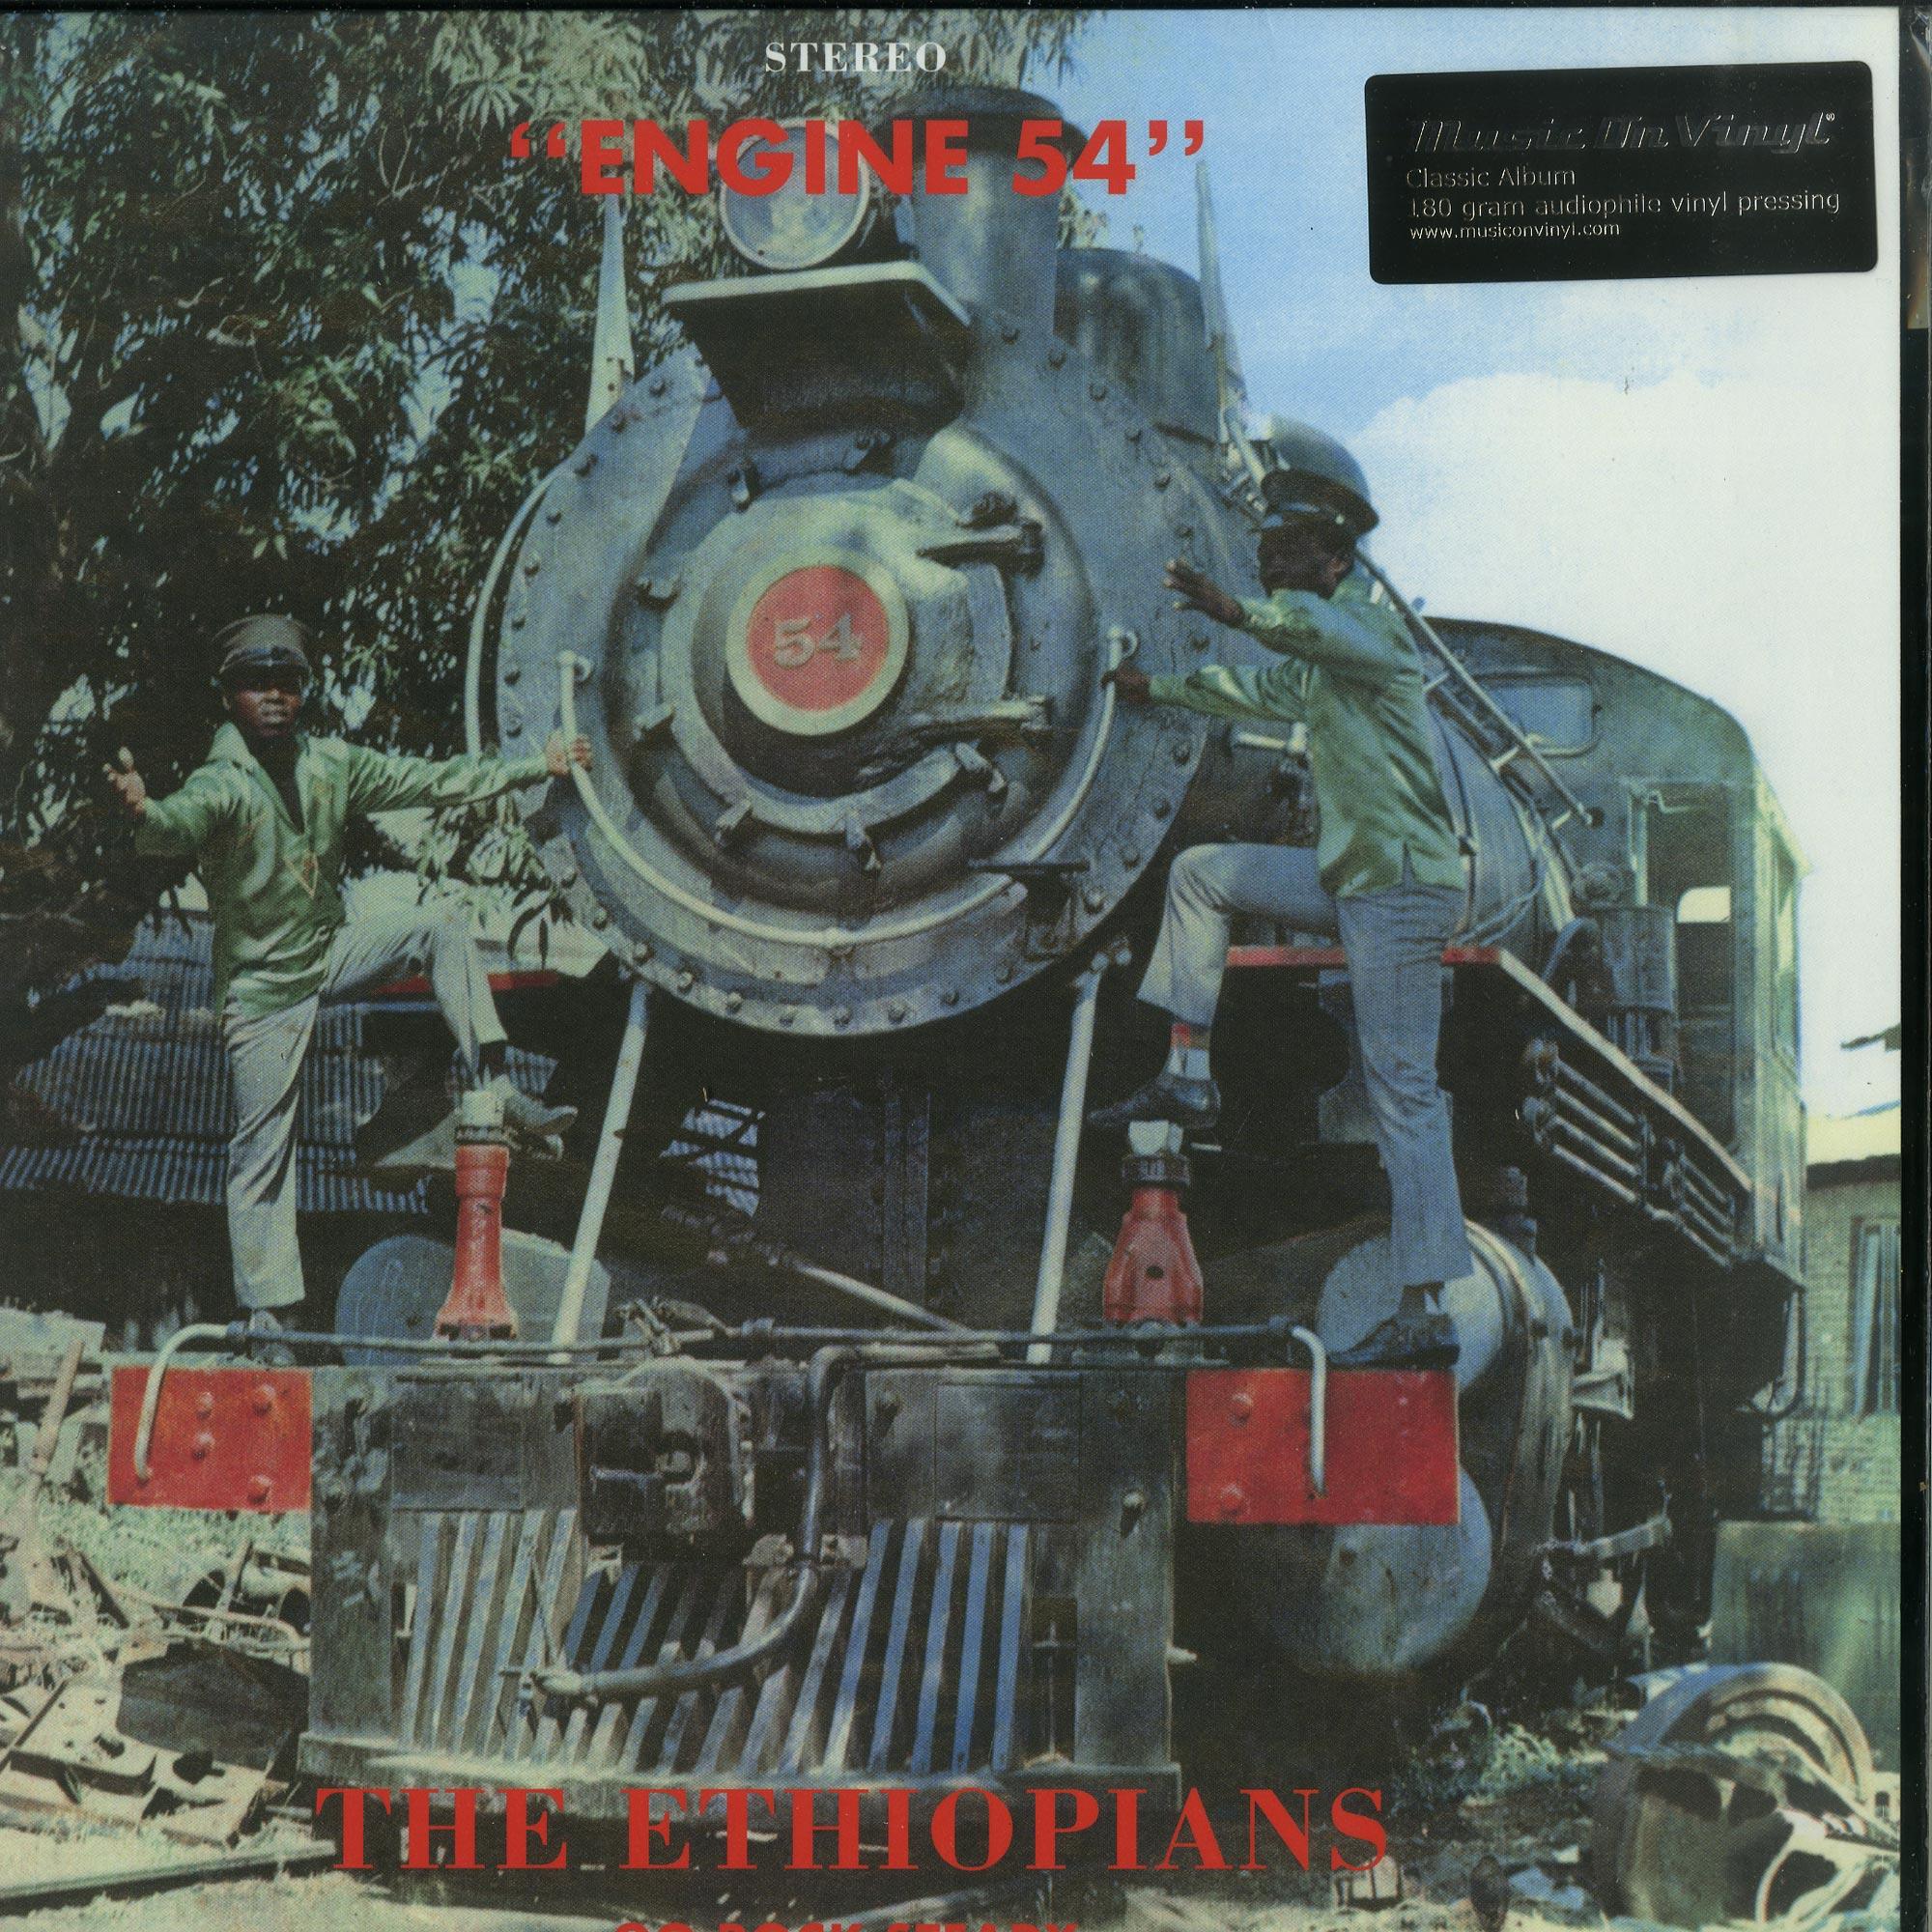 The Ethiopians - ENGINE 54